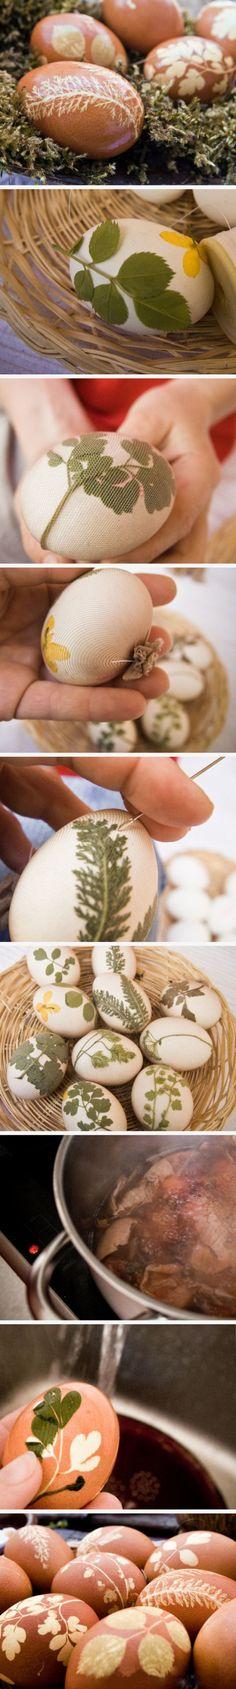 DIY pattern on egg